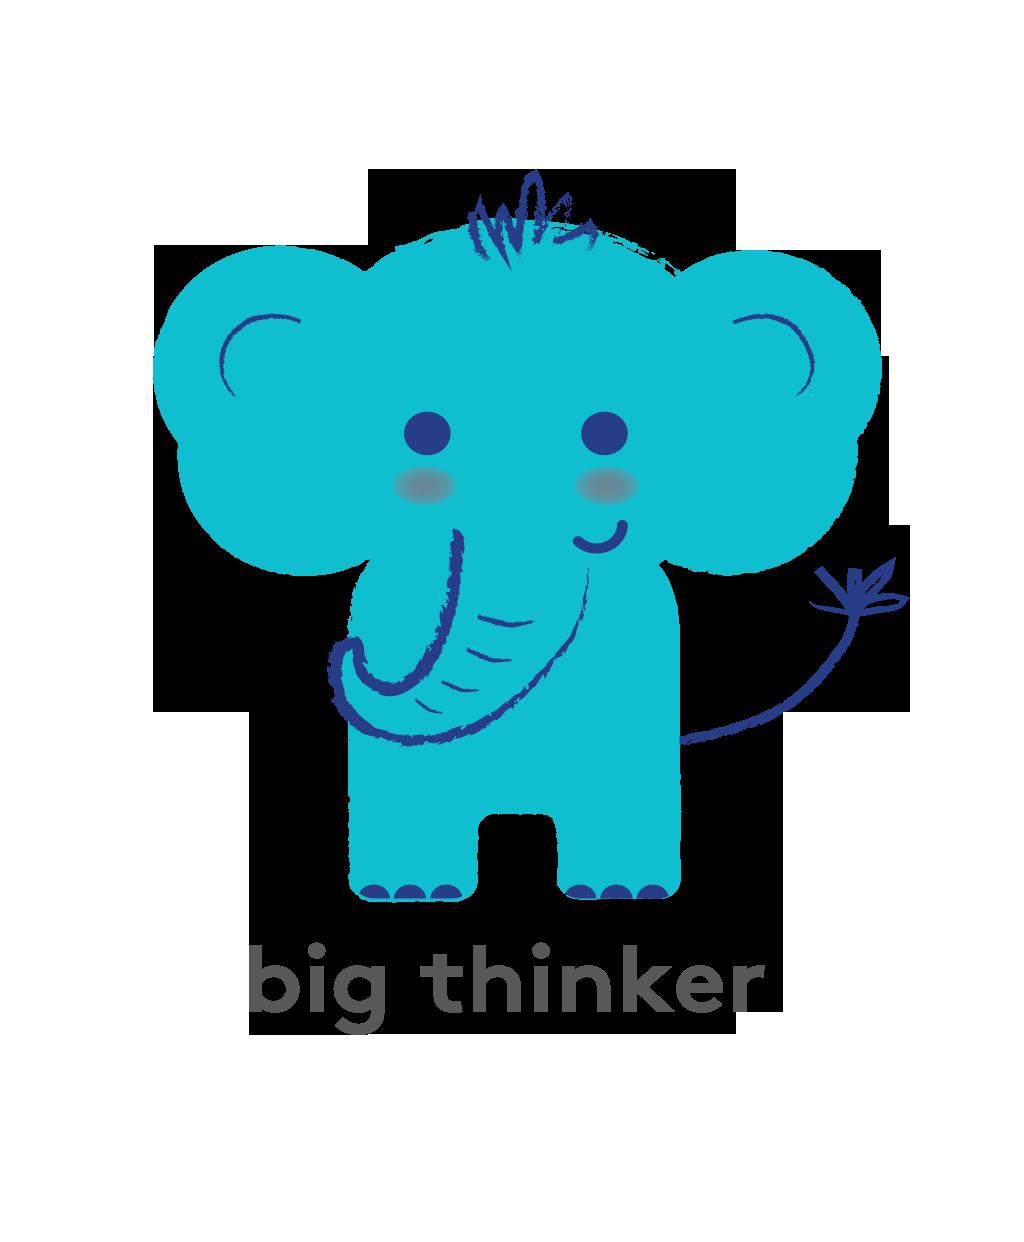 Elephant: Big Thinker